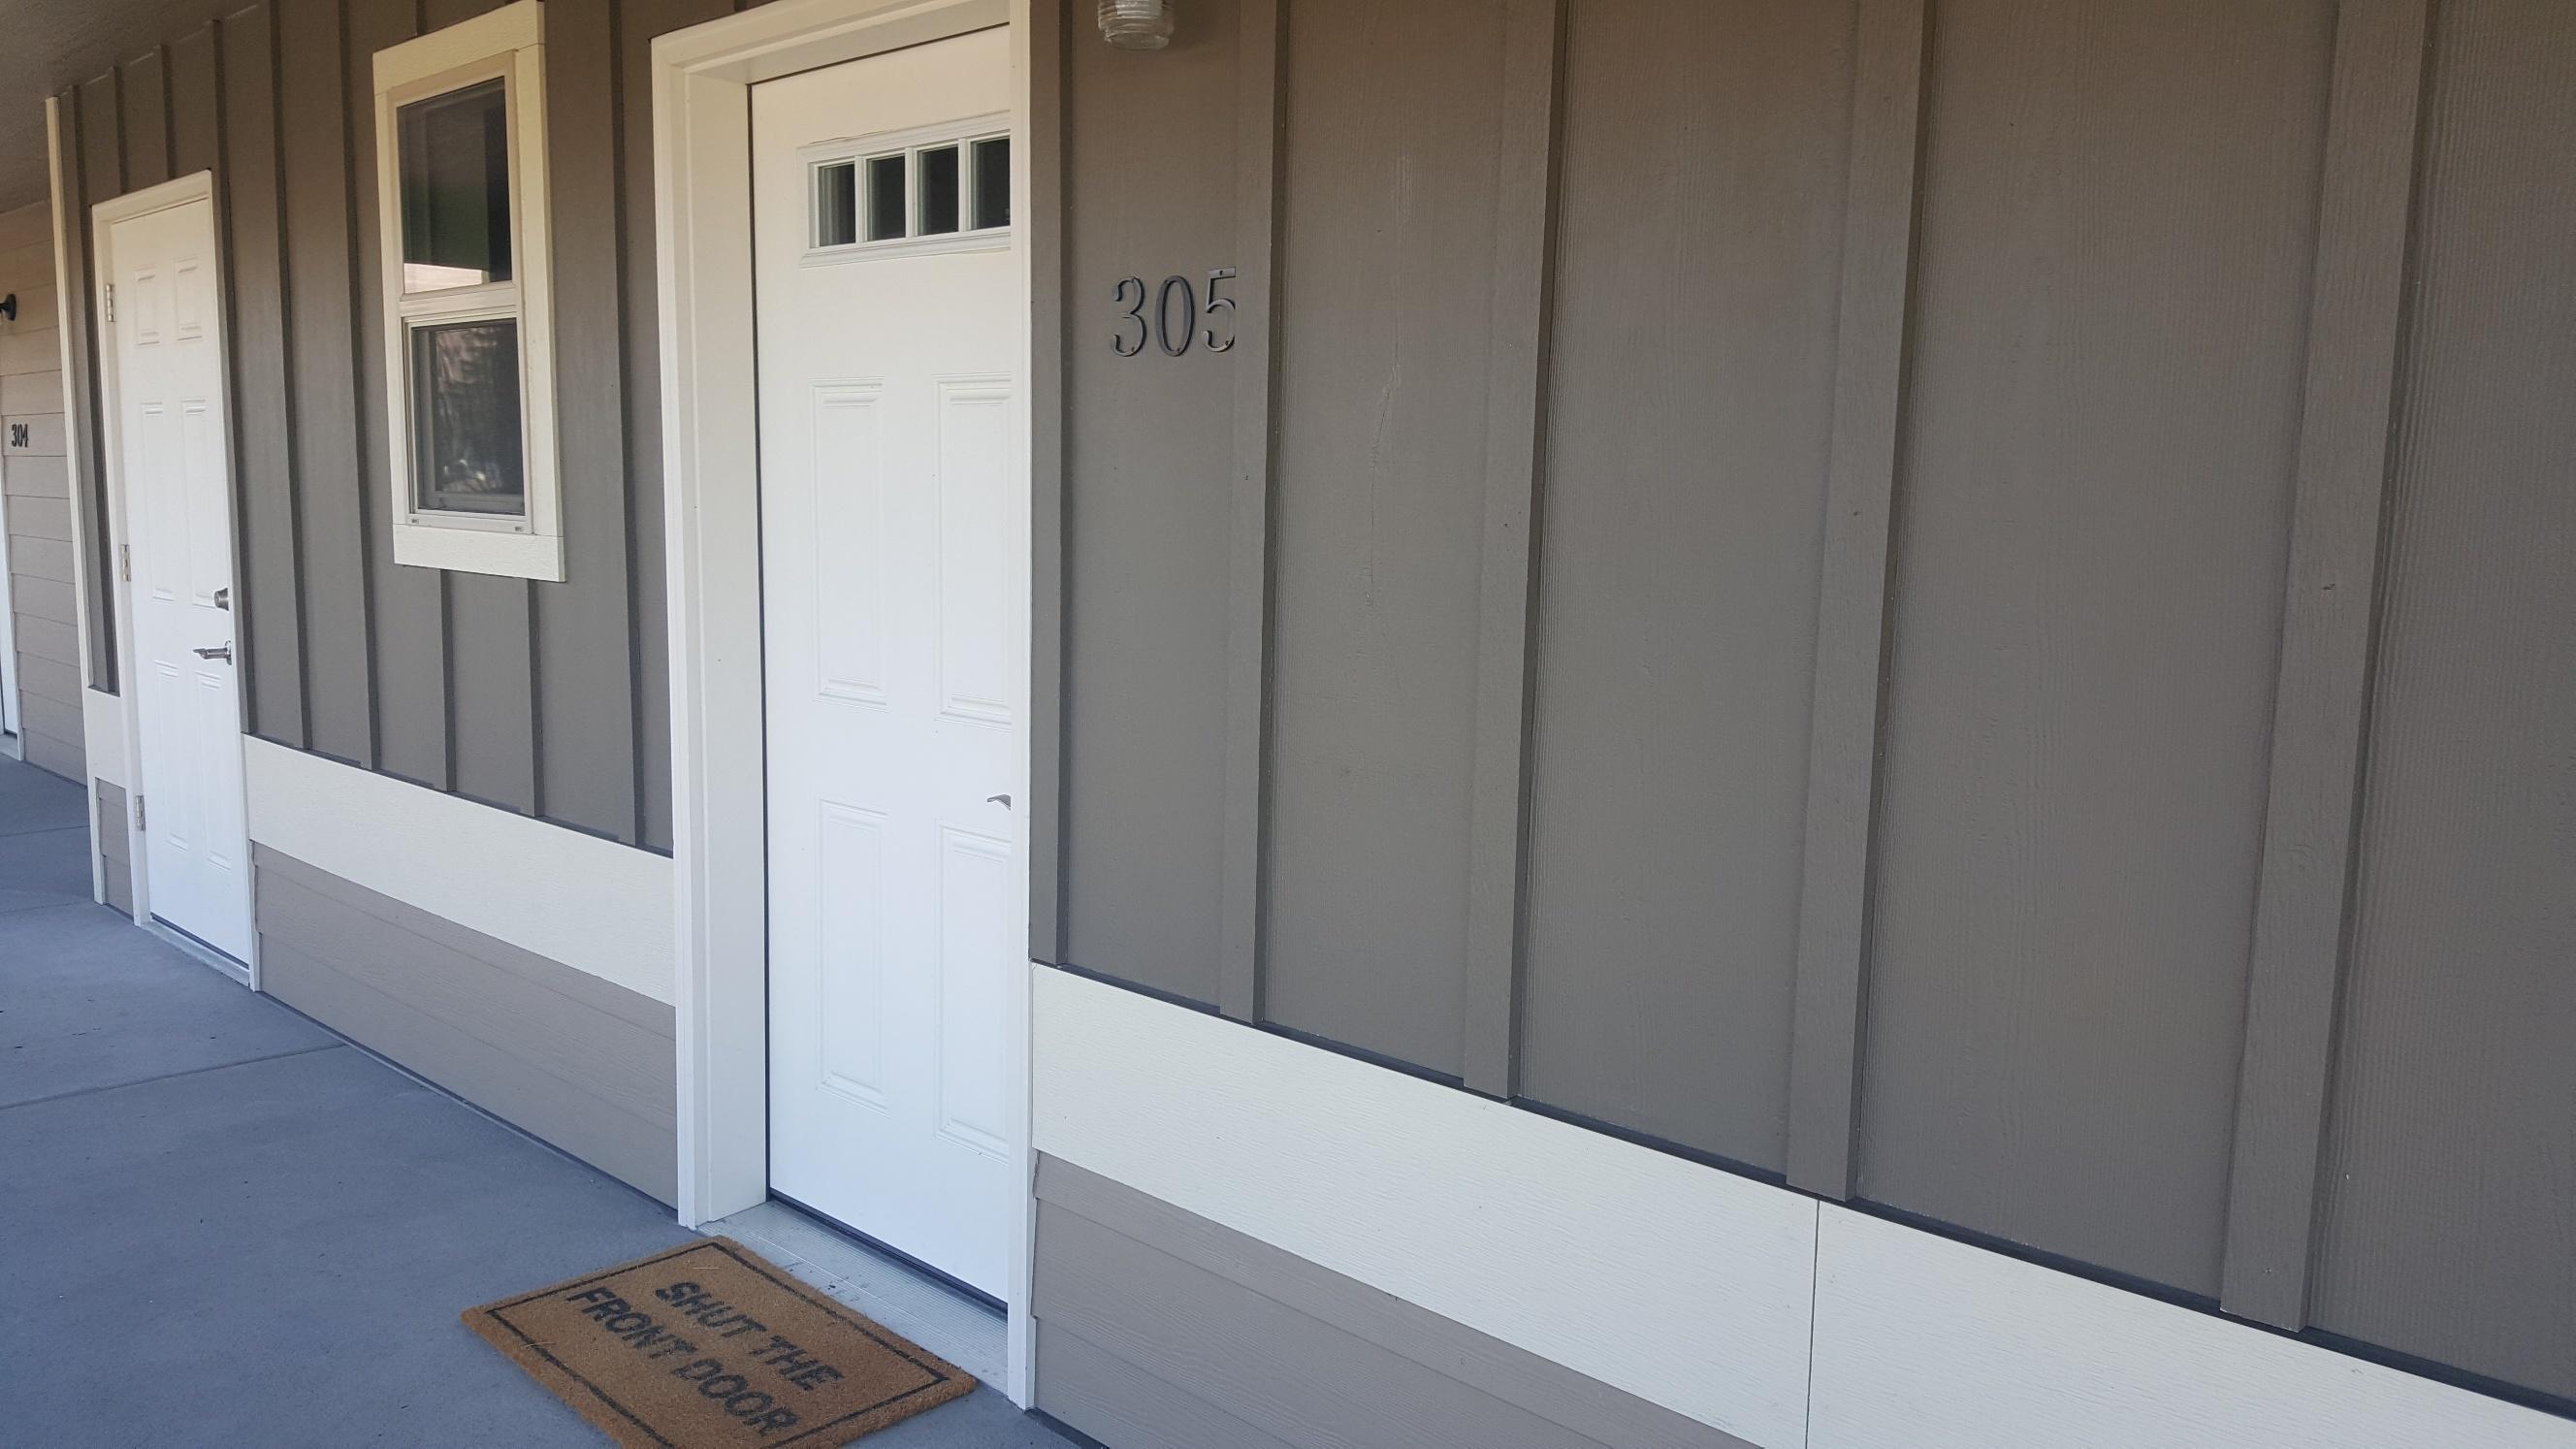 1245 Waverly Street #305, Missoula, MT 59802